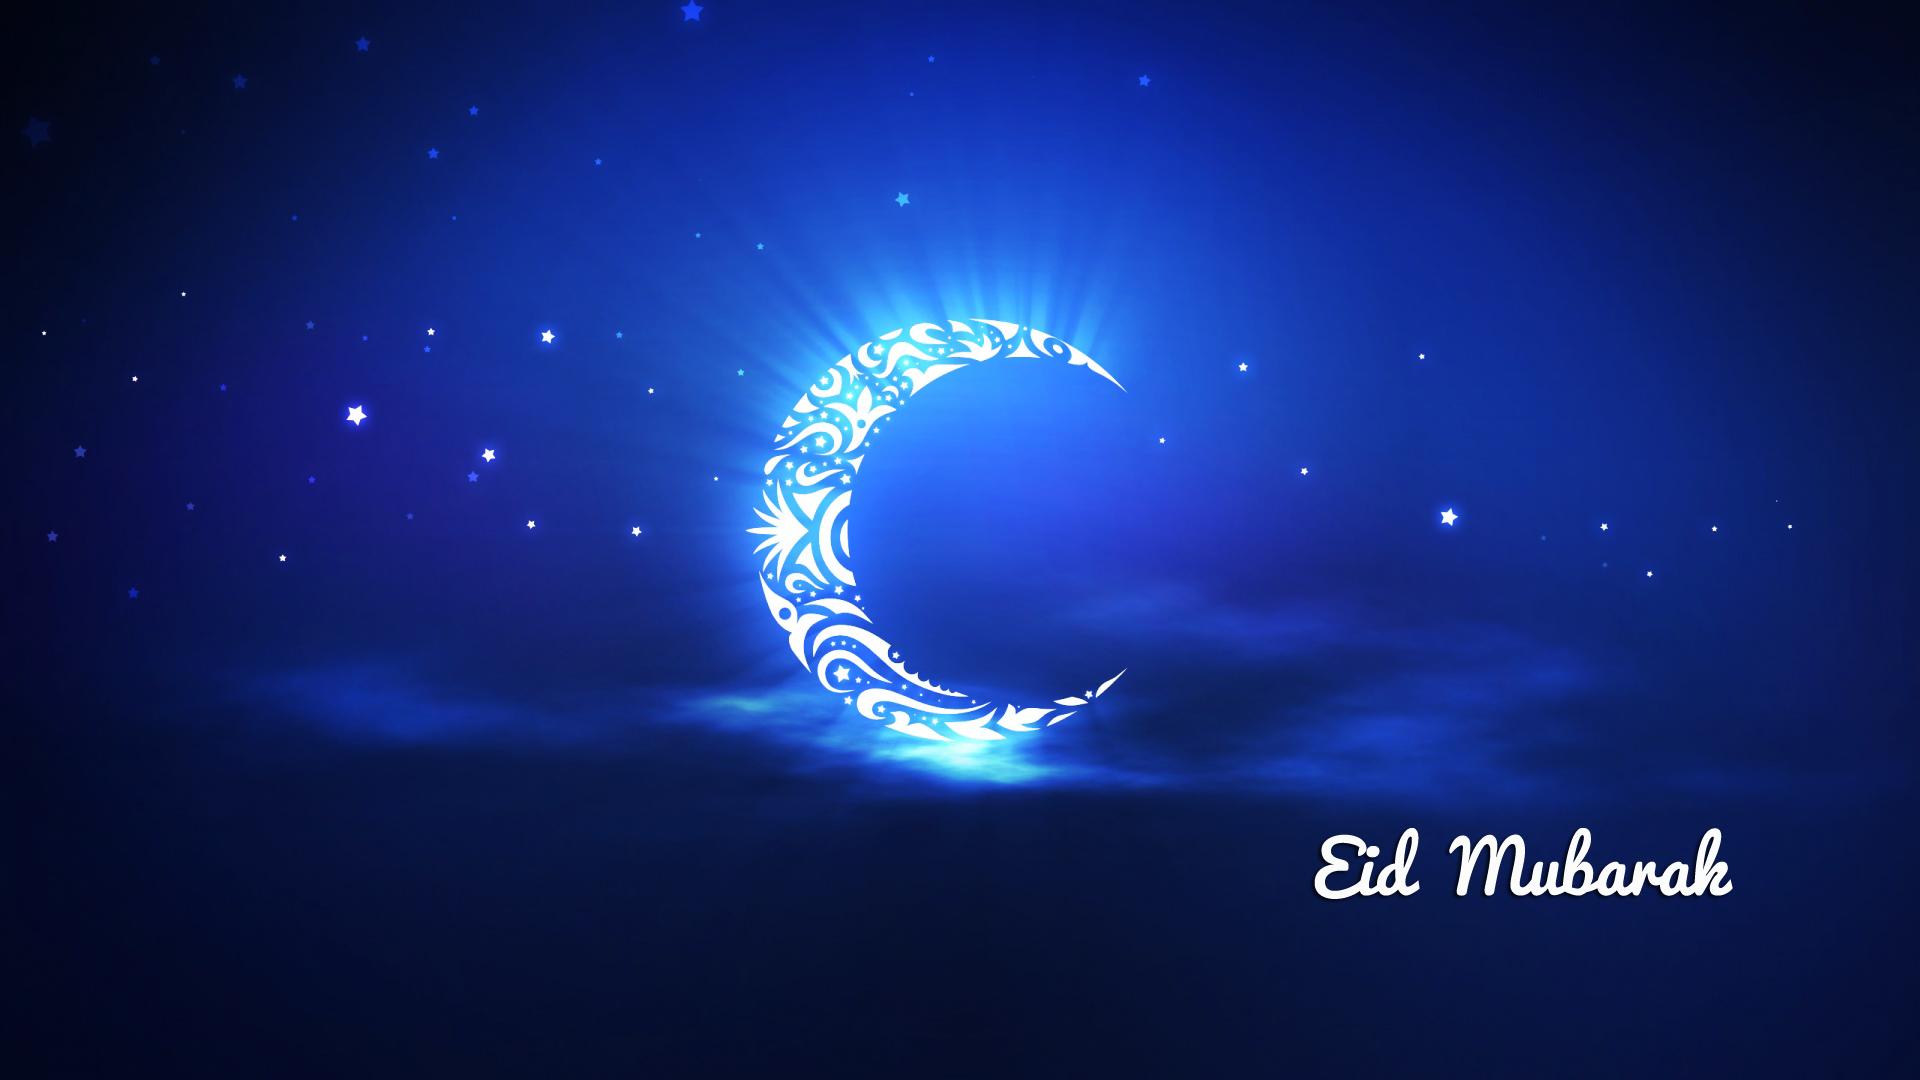 Wallpaper download eid -  Eid Mubarak Hd Photos Wallpaper Download